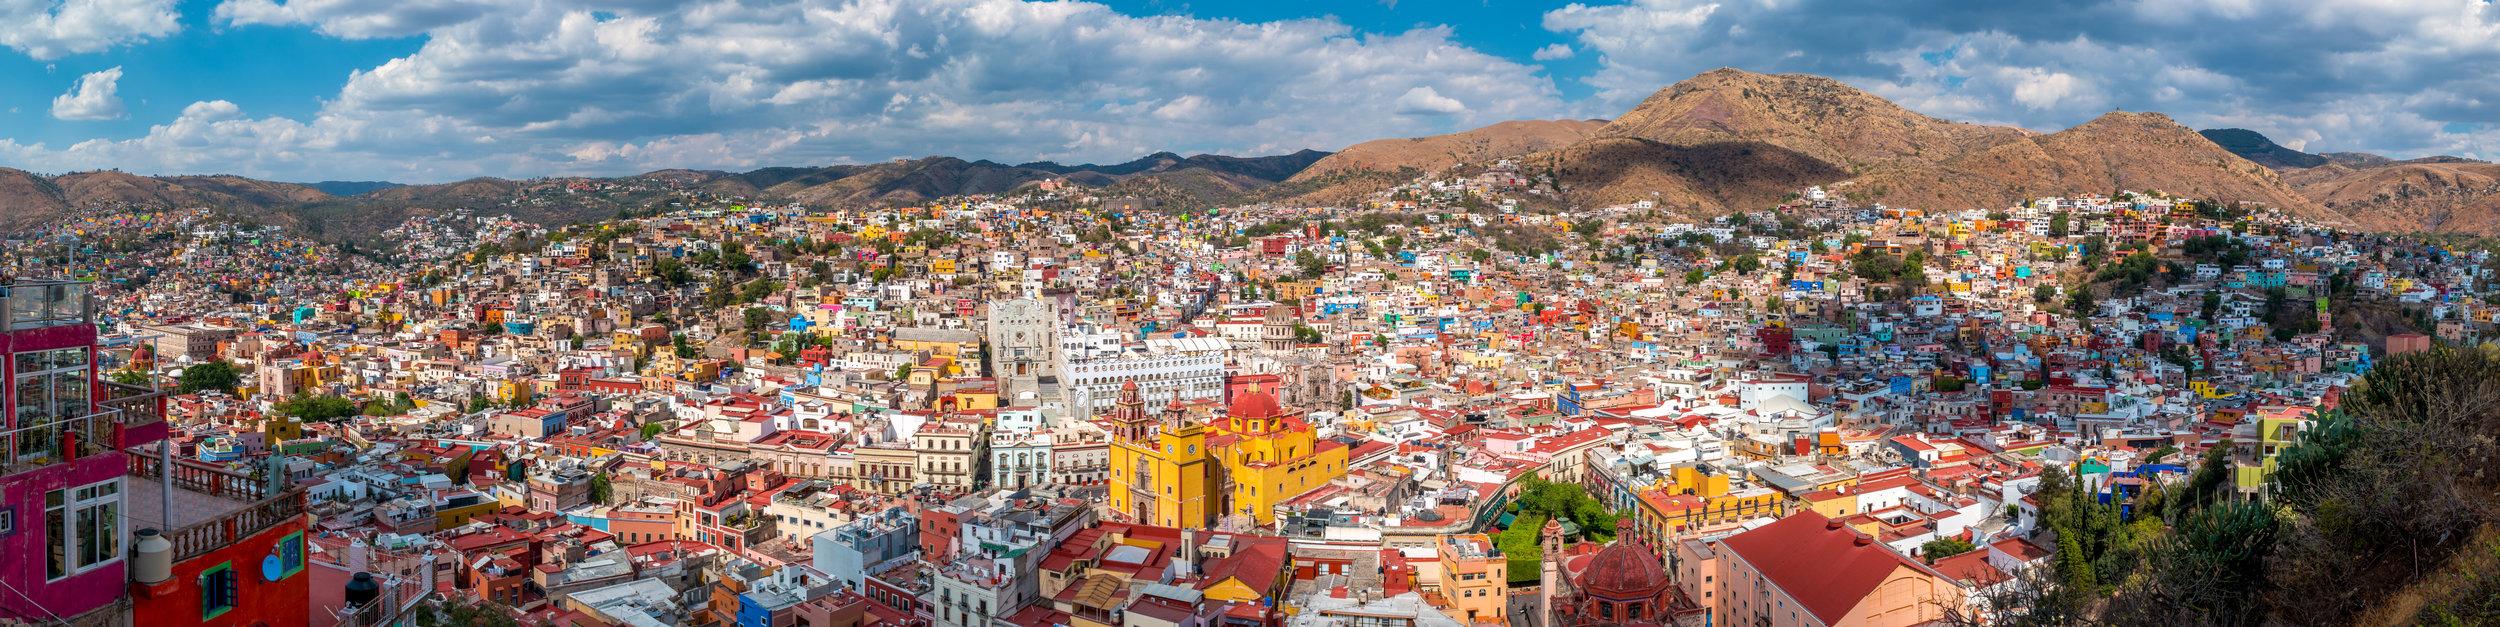 Wasim Muklashy Photography_Guanajuato_Mexico_Panorama.jpg